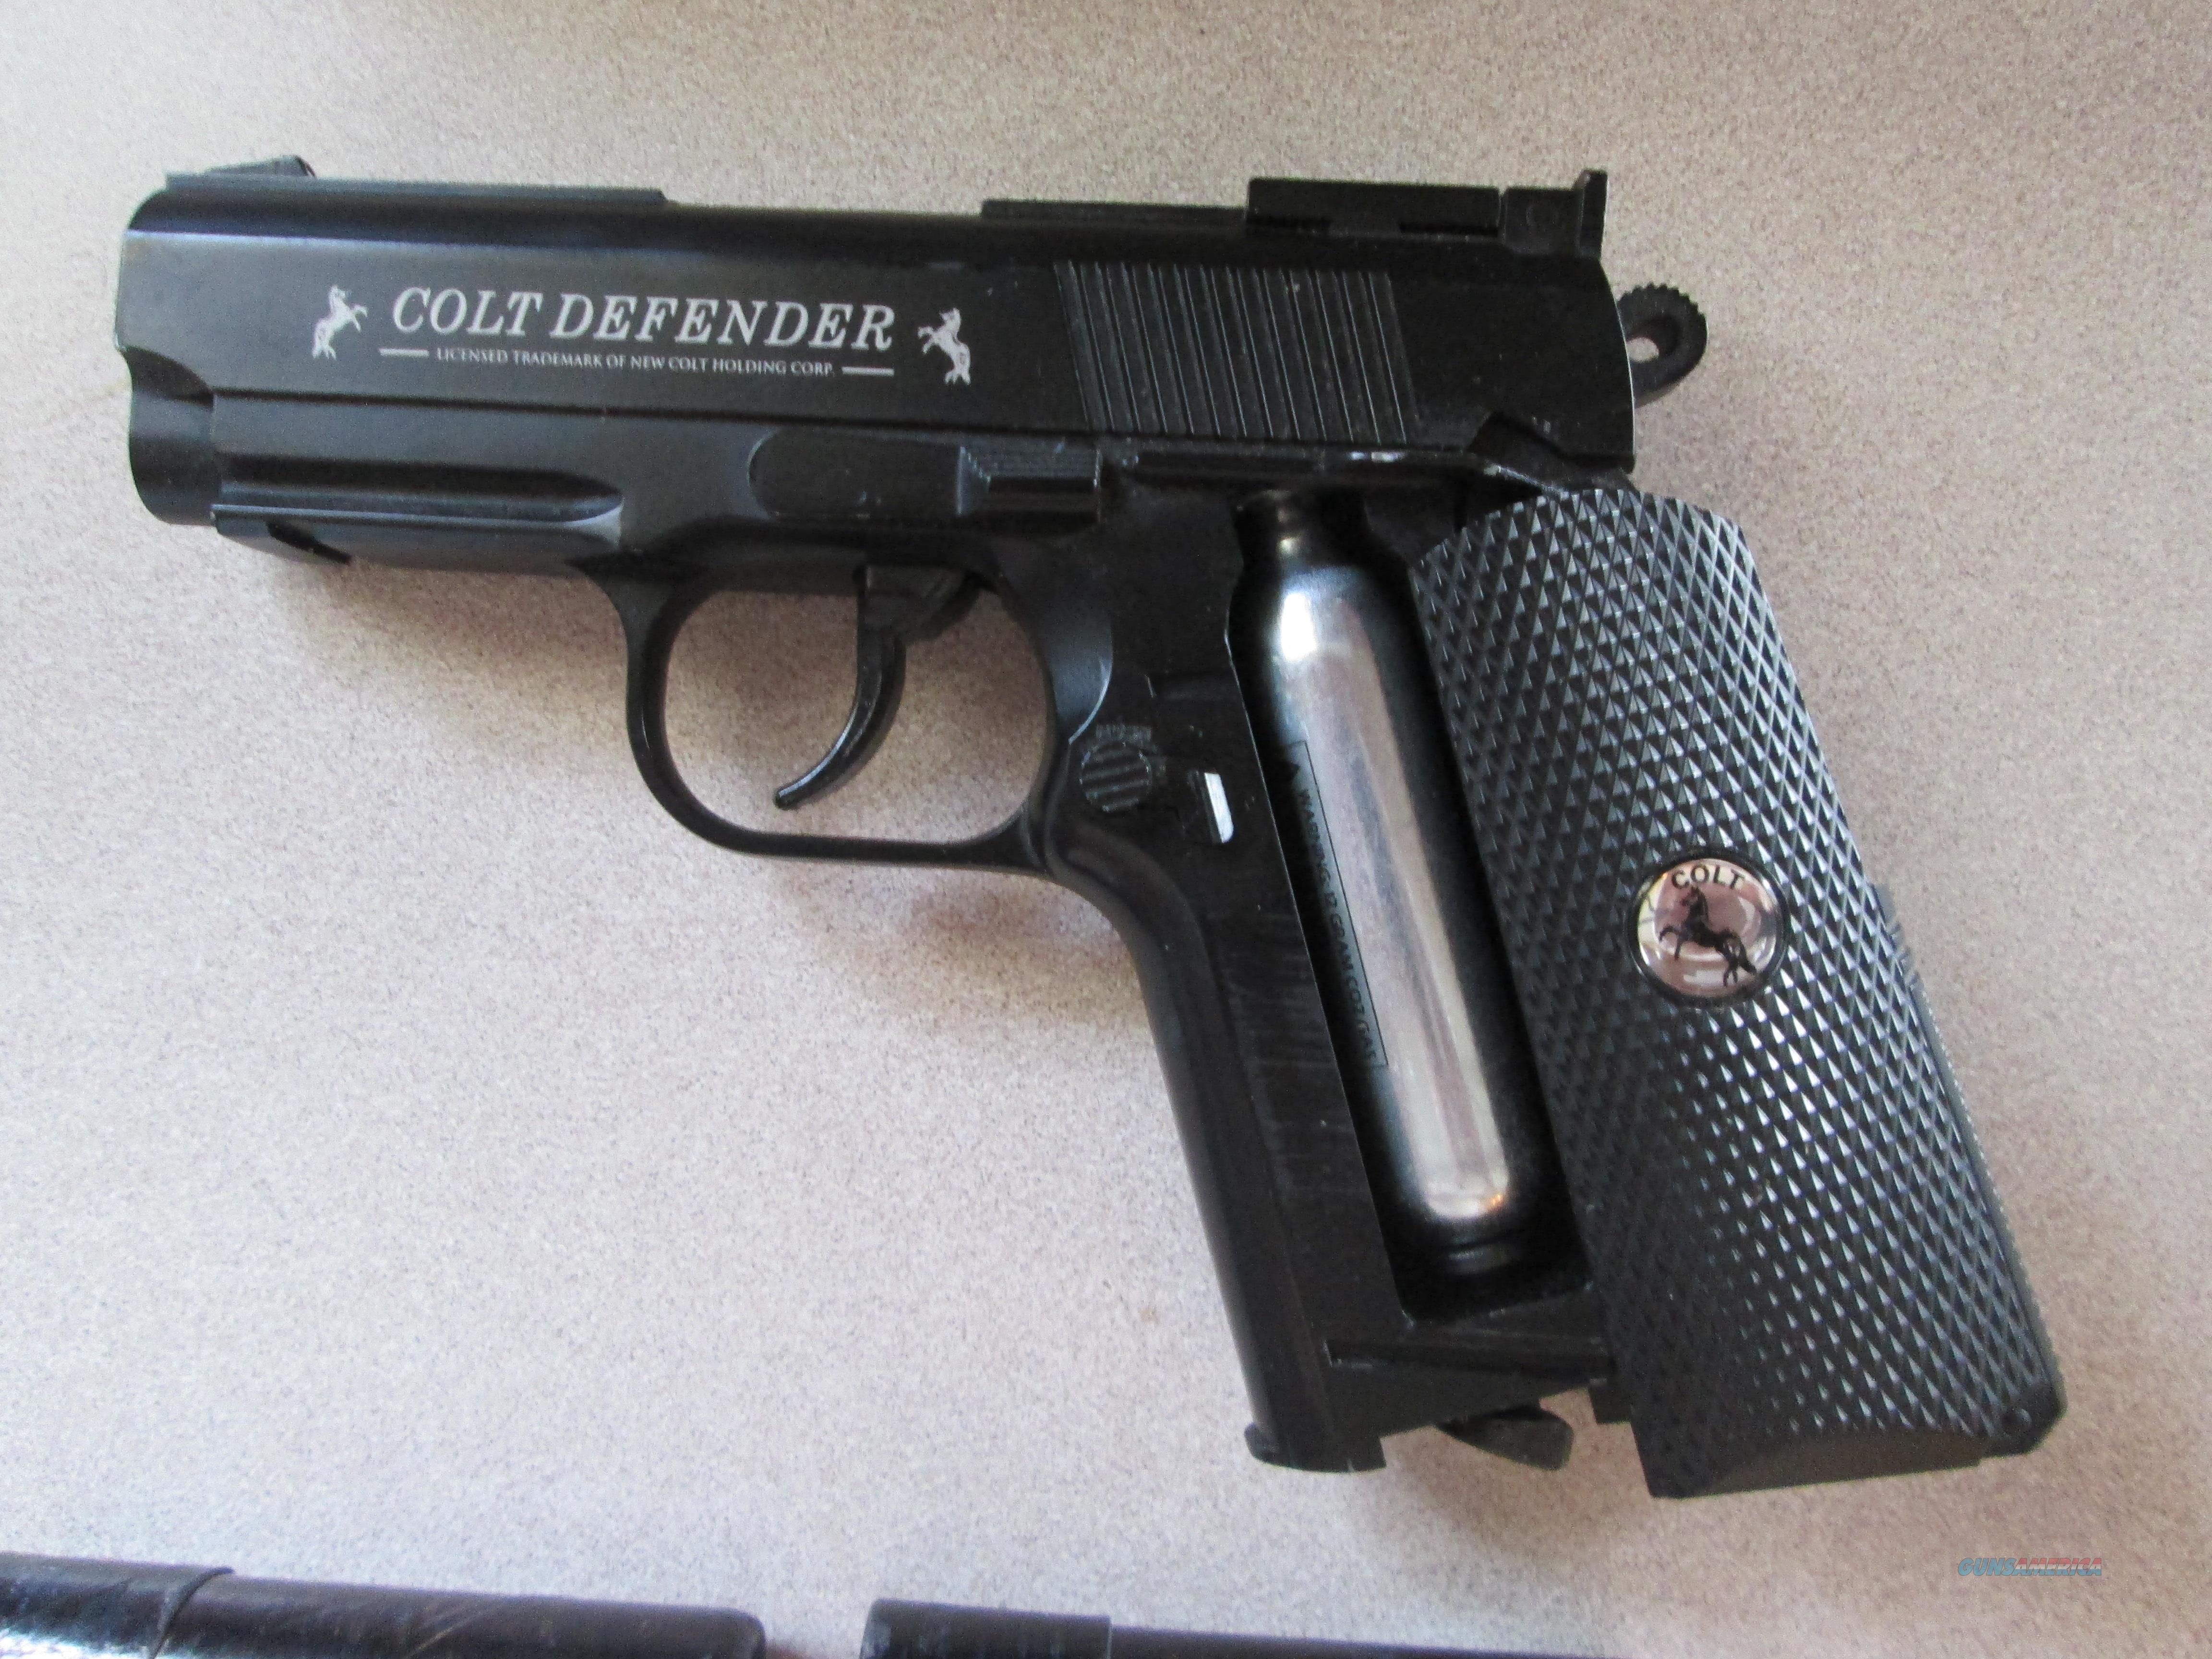 Colt Defender BB gun